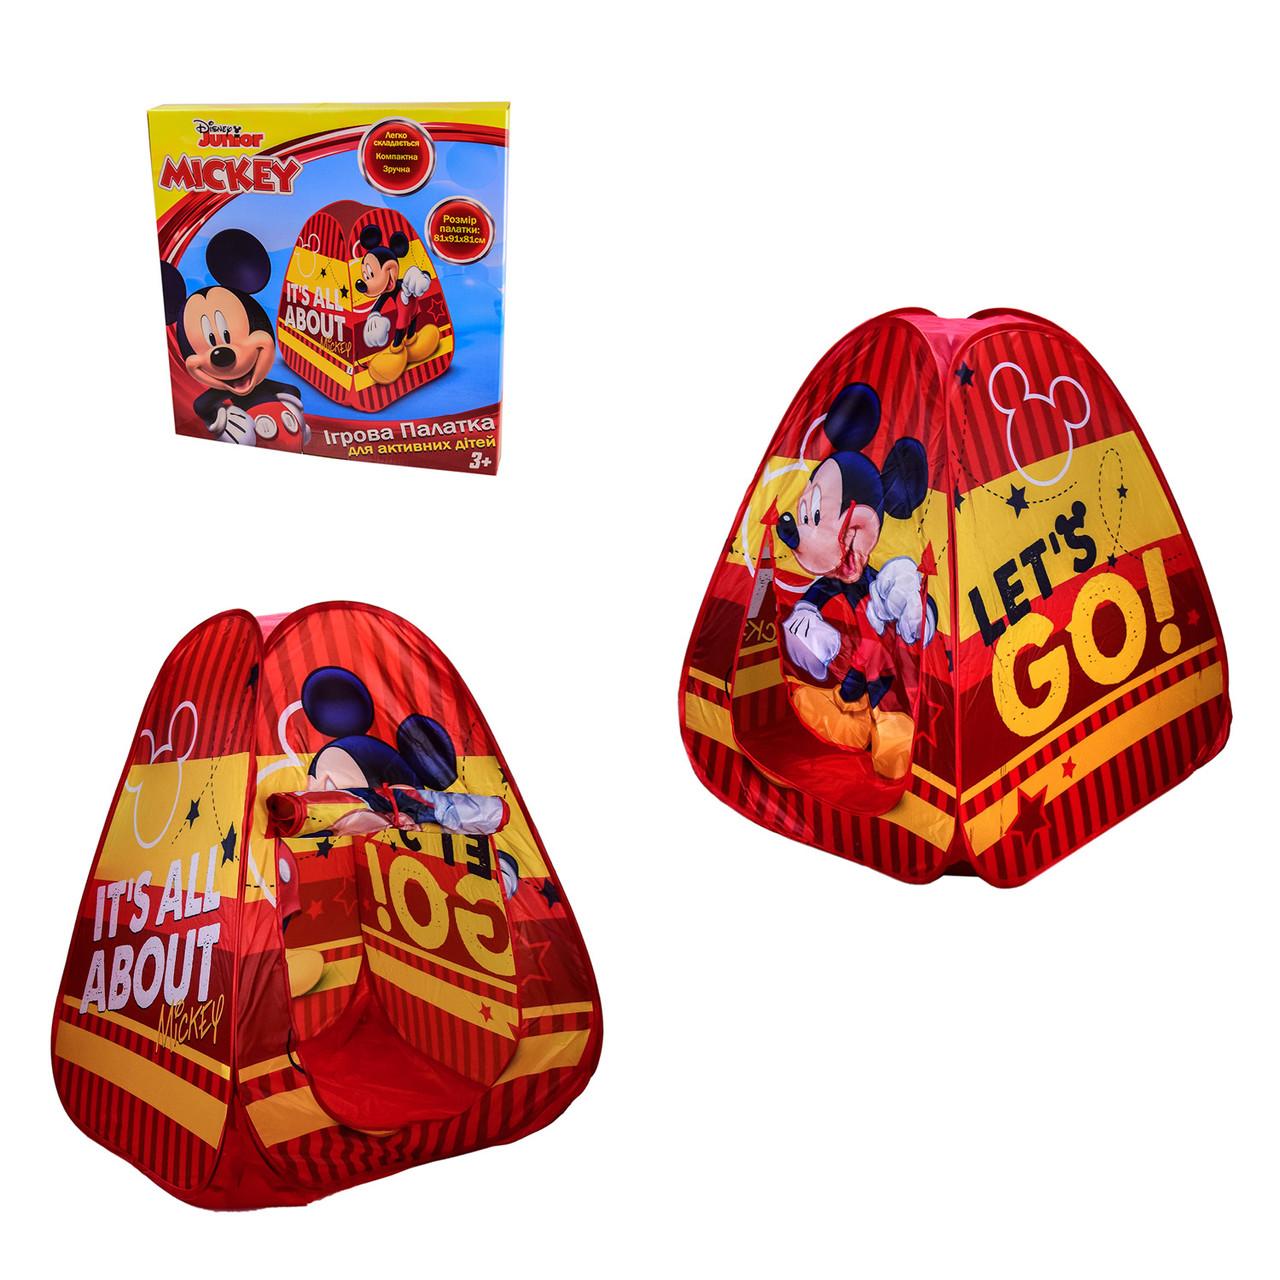 Палатка-домик Микки Маус - Mickey Mouse 81*81*81 см, Палатки игровые